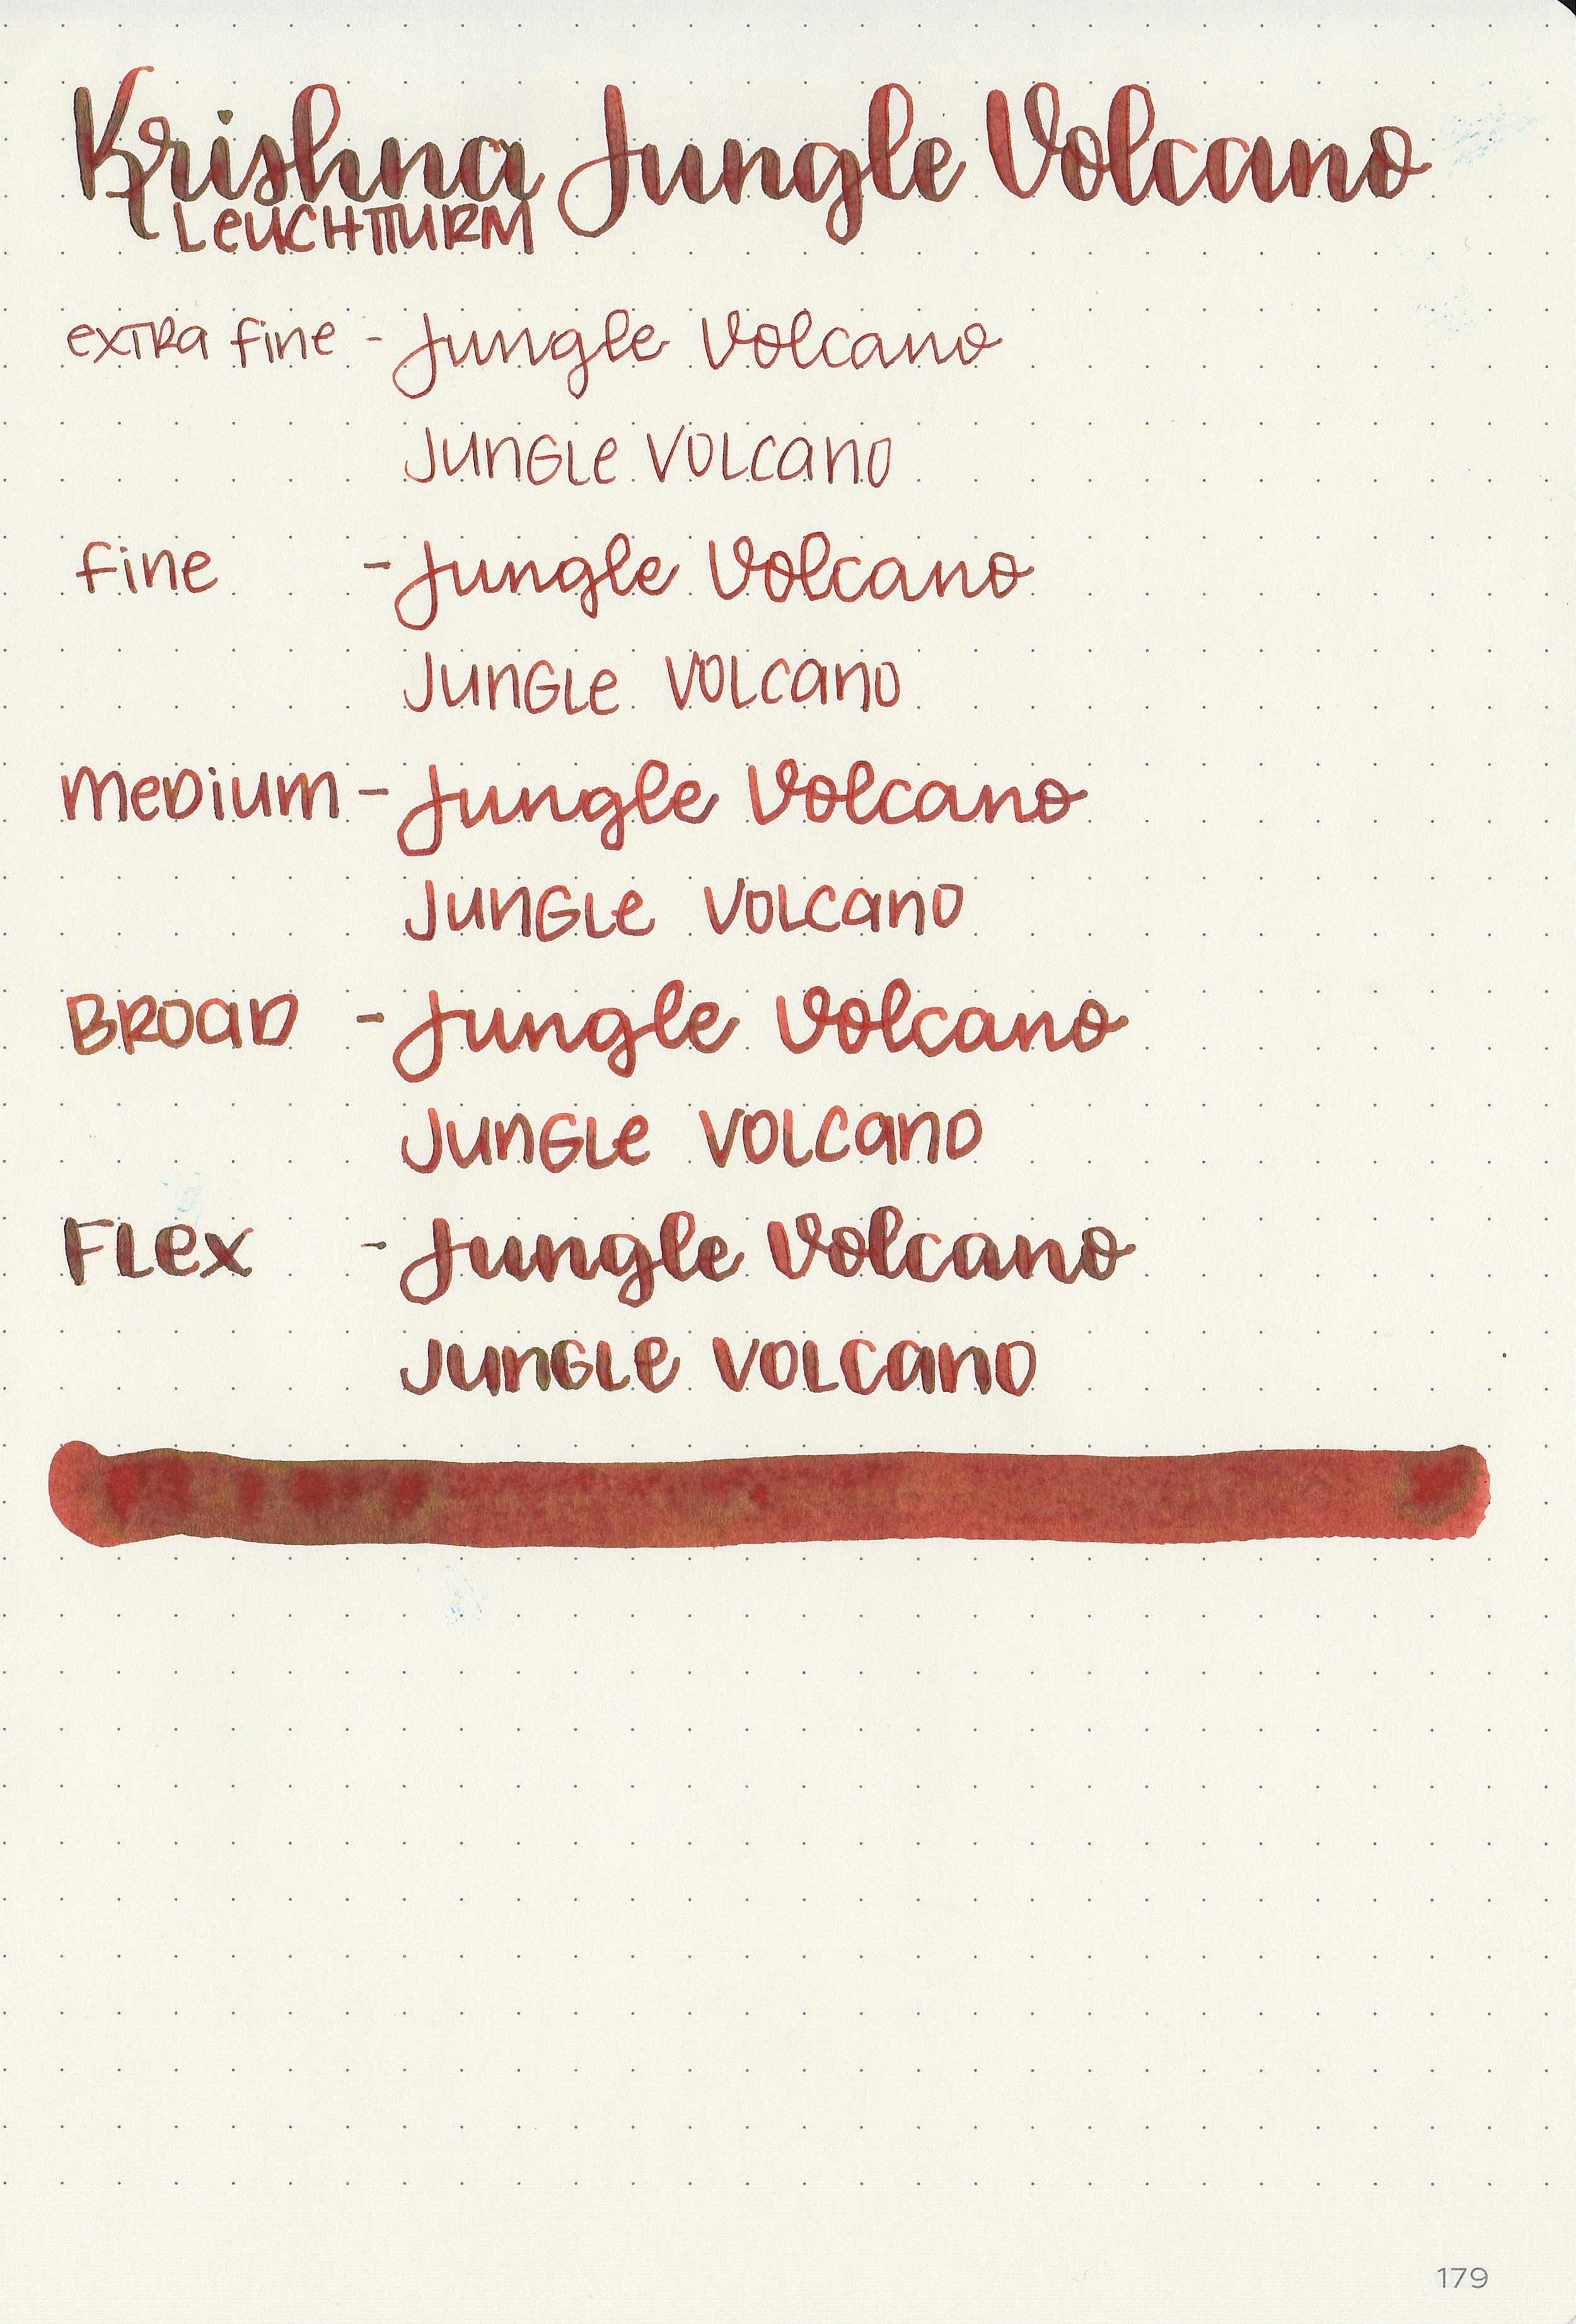 kri-jungle-volcano-7.jpg